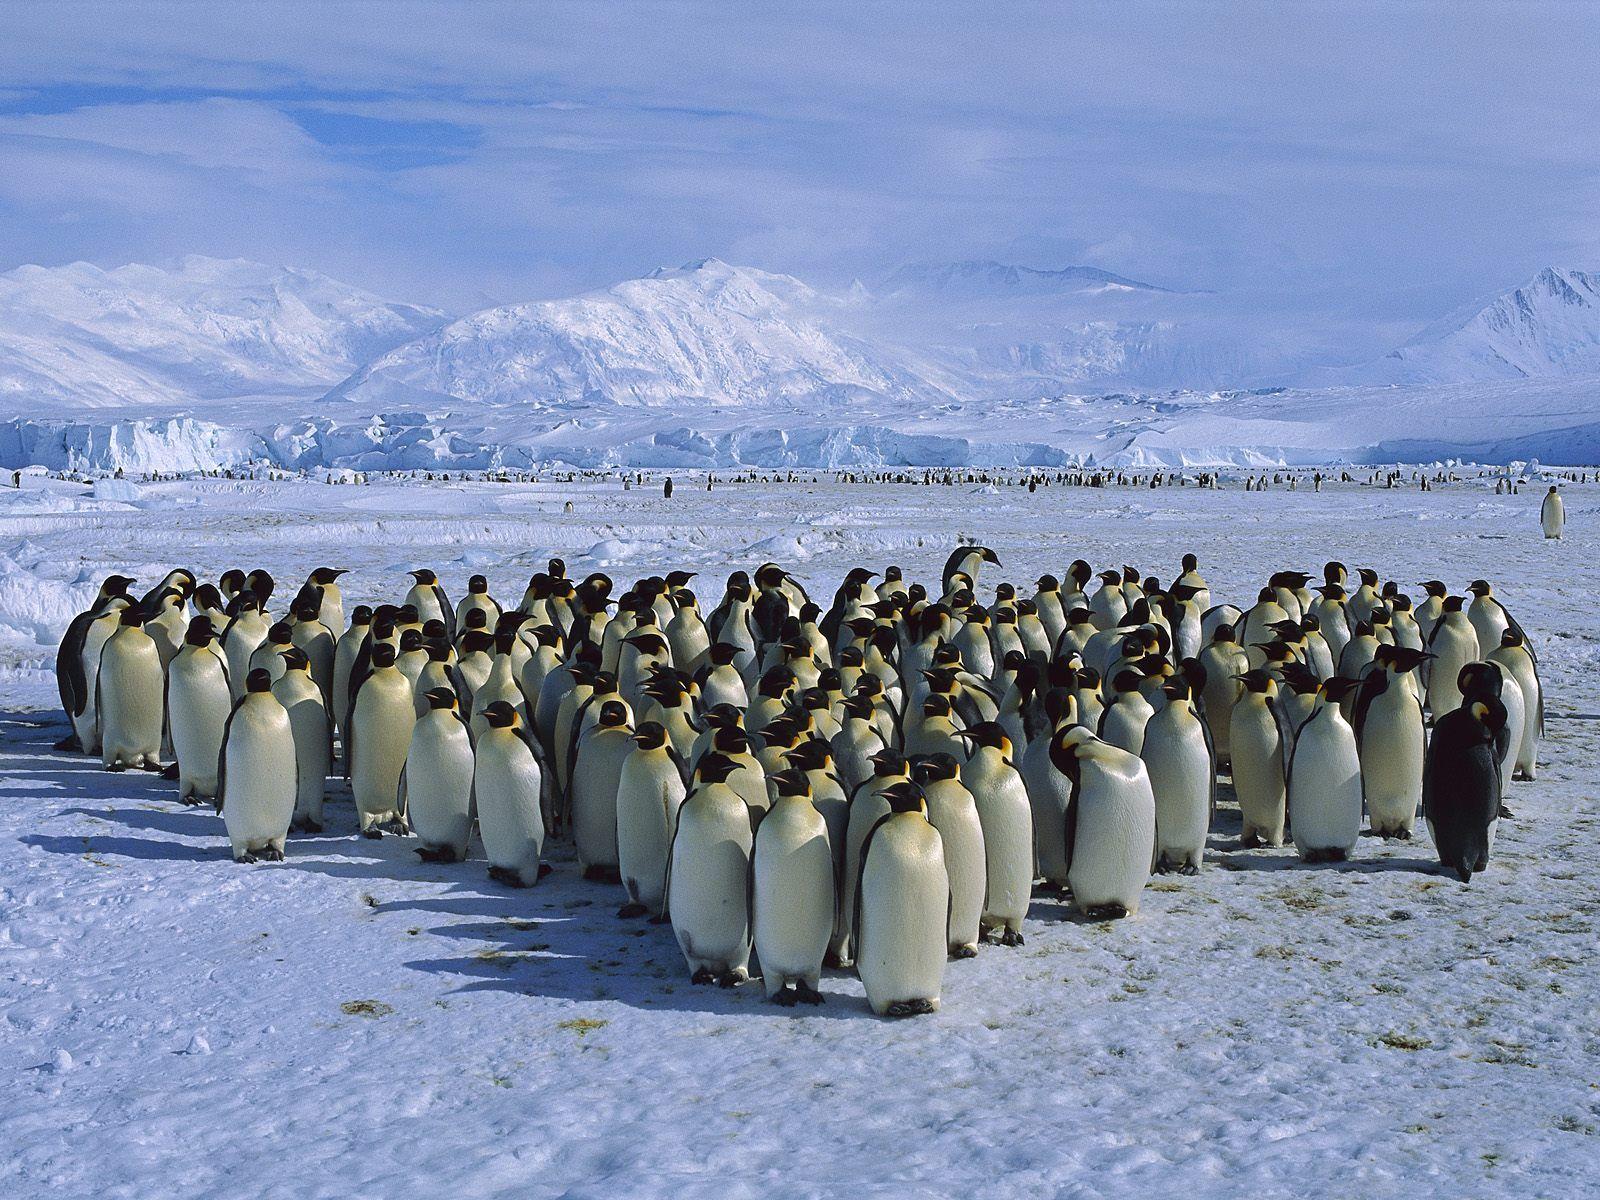 http://4.bp.blogspot.com/-6Tn4HA8ZKl8/TjmOdxCZ-pI/AAAAAAAAAOk/94IOLMwyItc/s1600/Penguin+Wallpapers+10.jpg